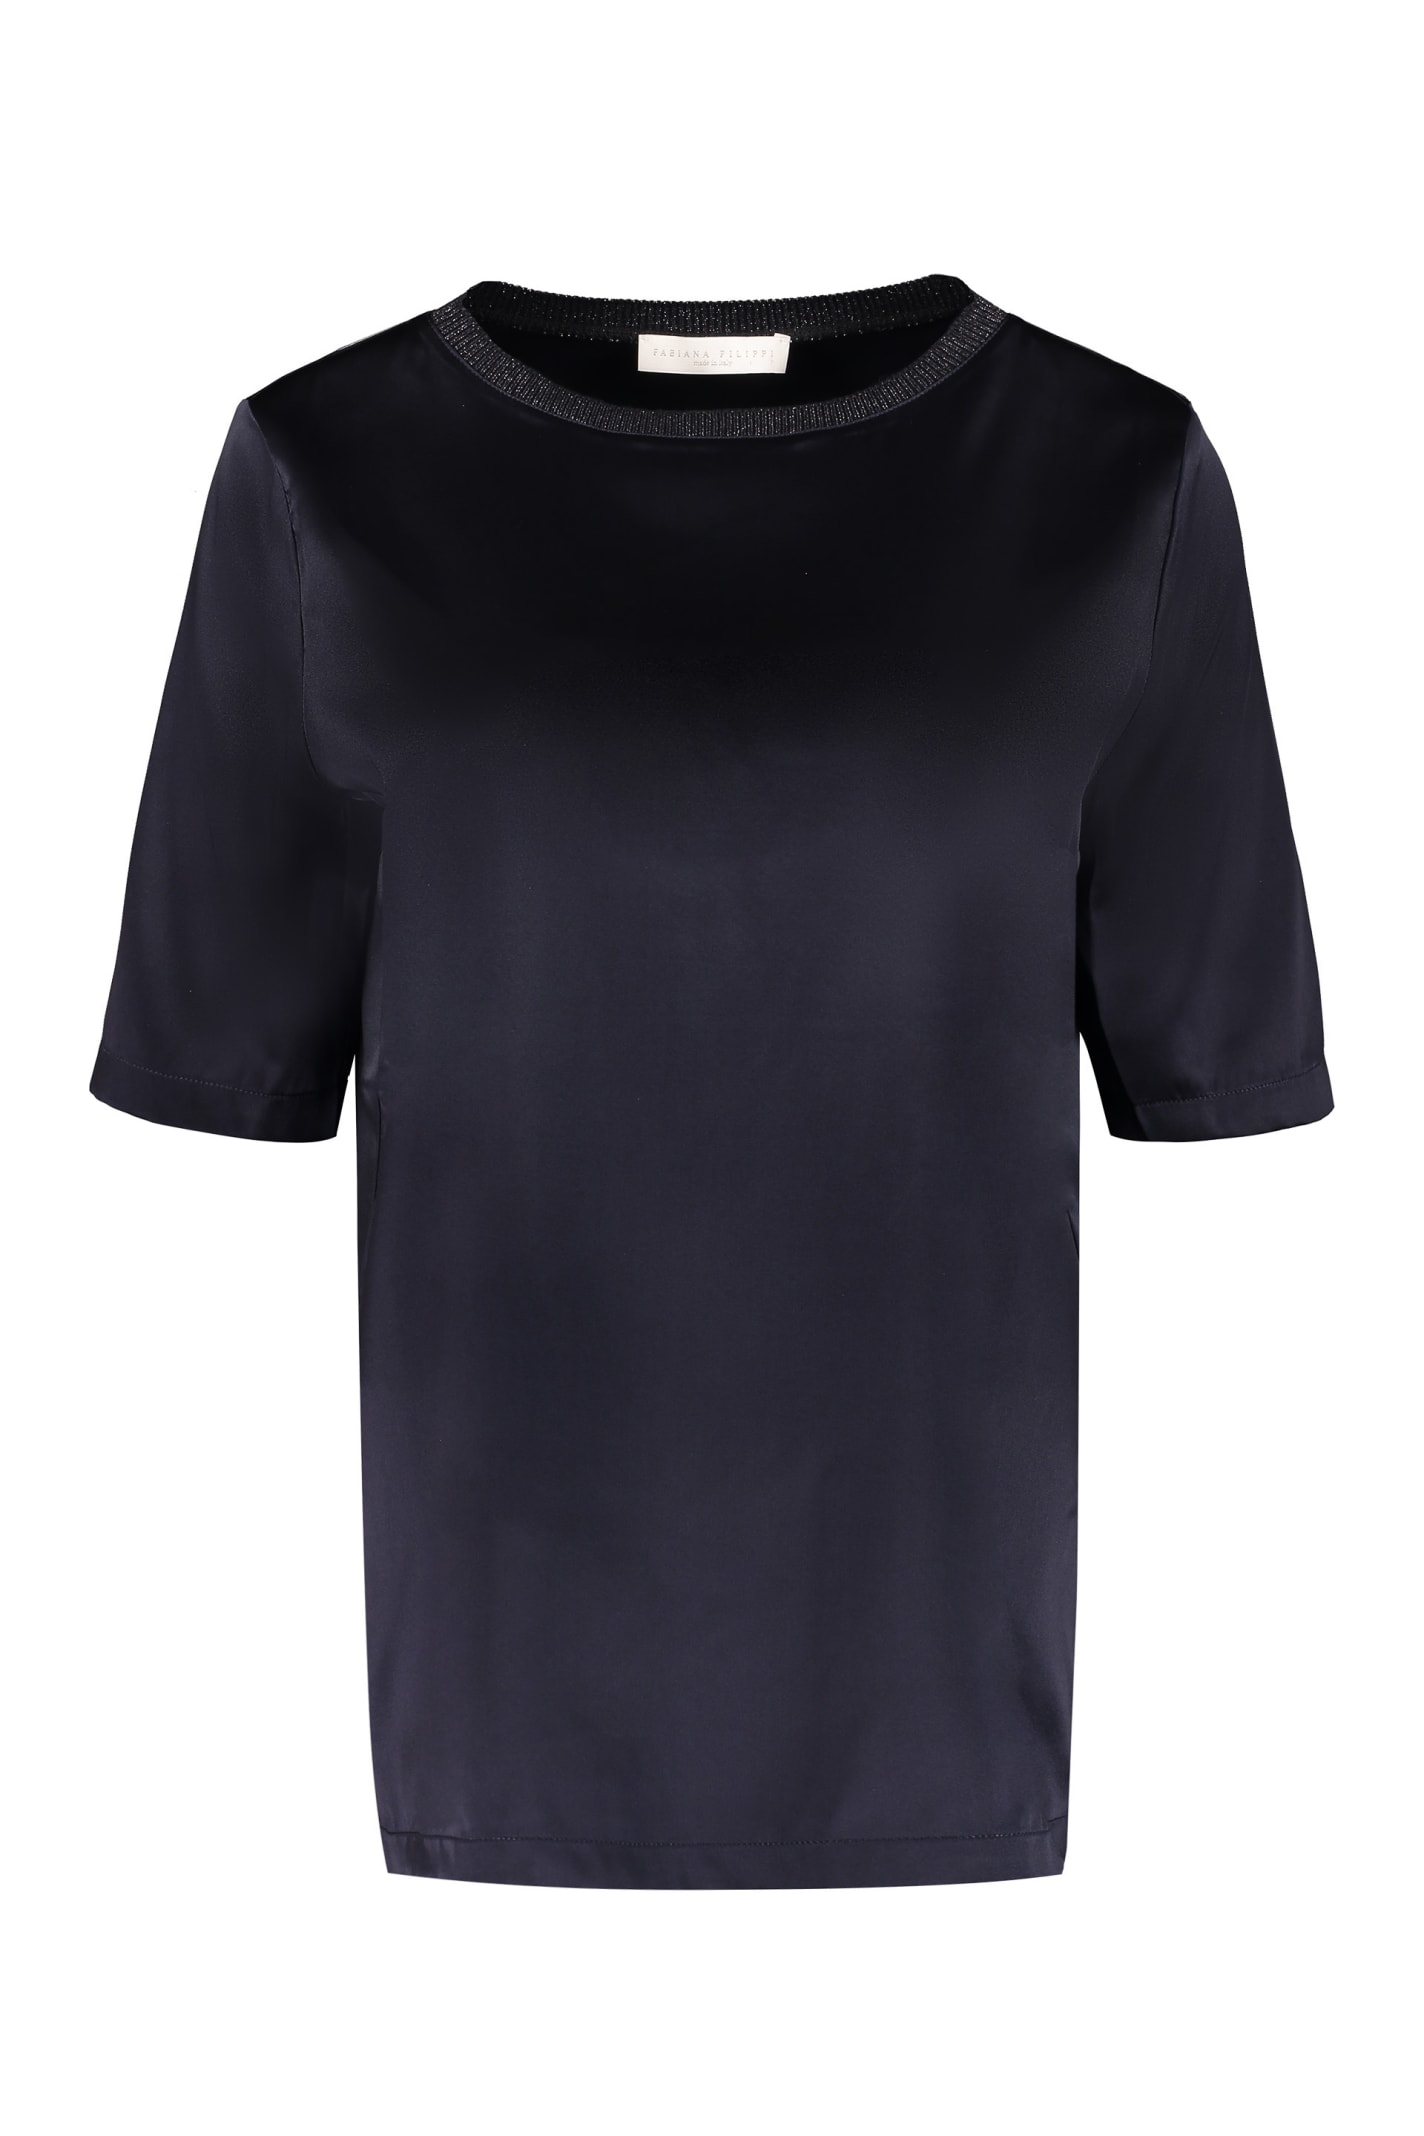 Fabiana Filippi Silk Satin T-shirt